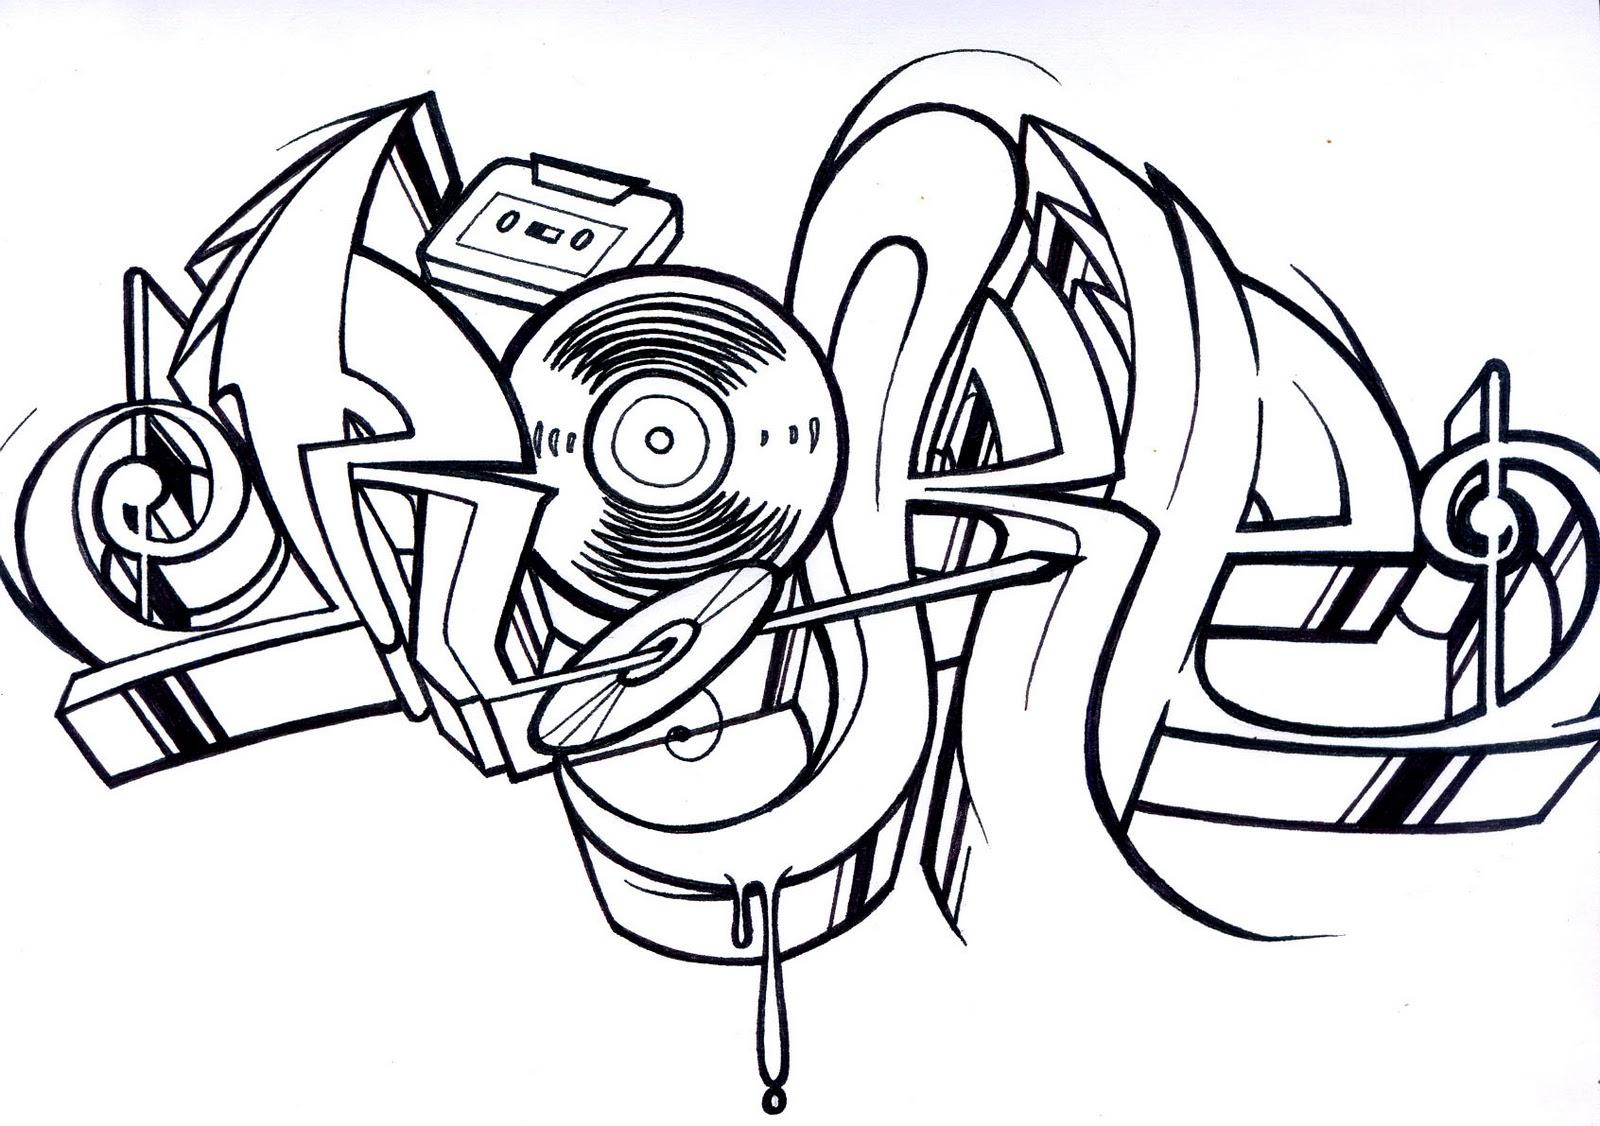 Letras De Graffitis Abecedario Cholas Full Resolution